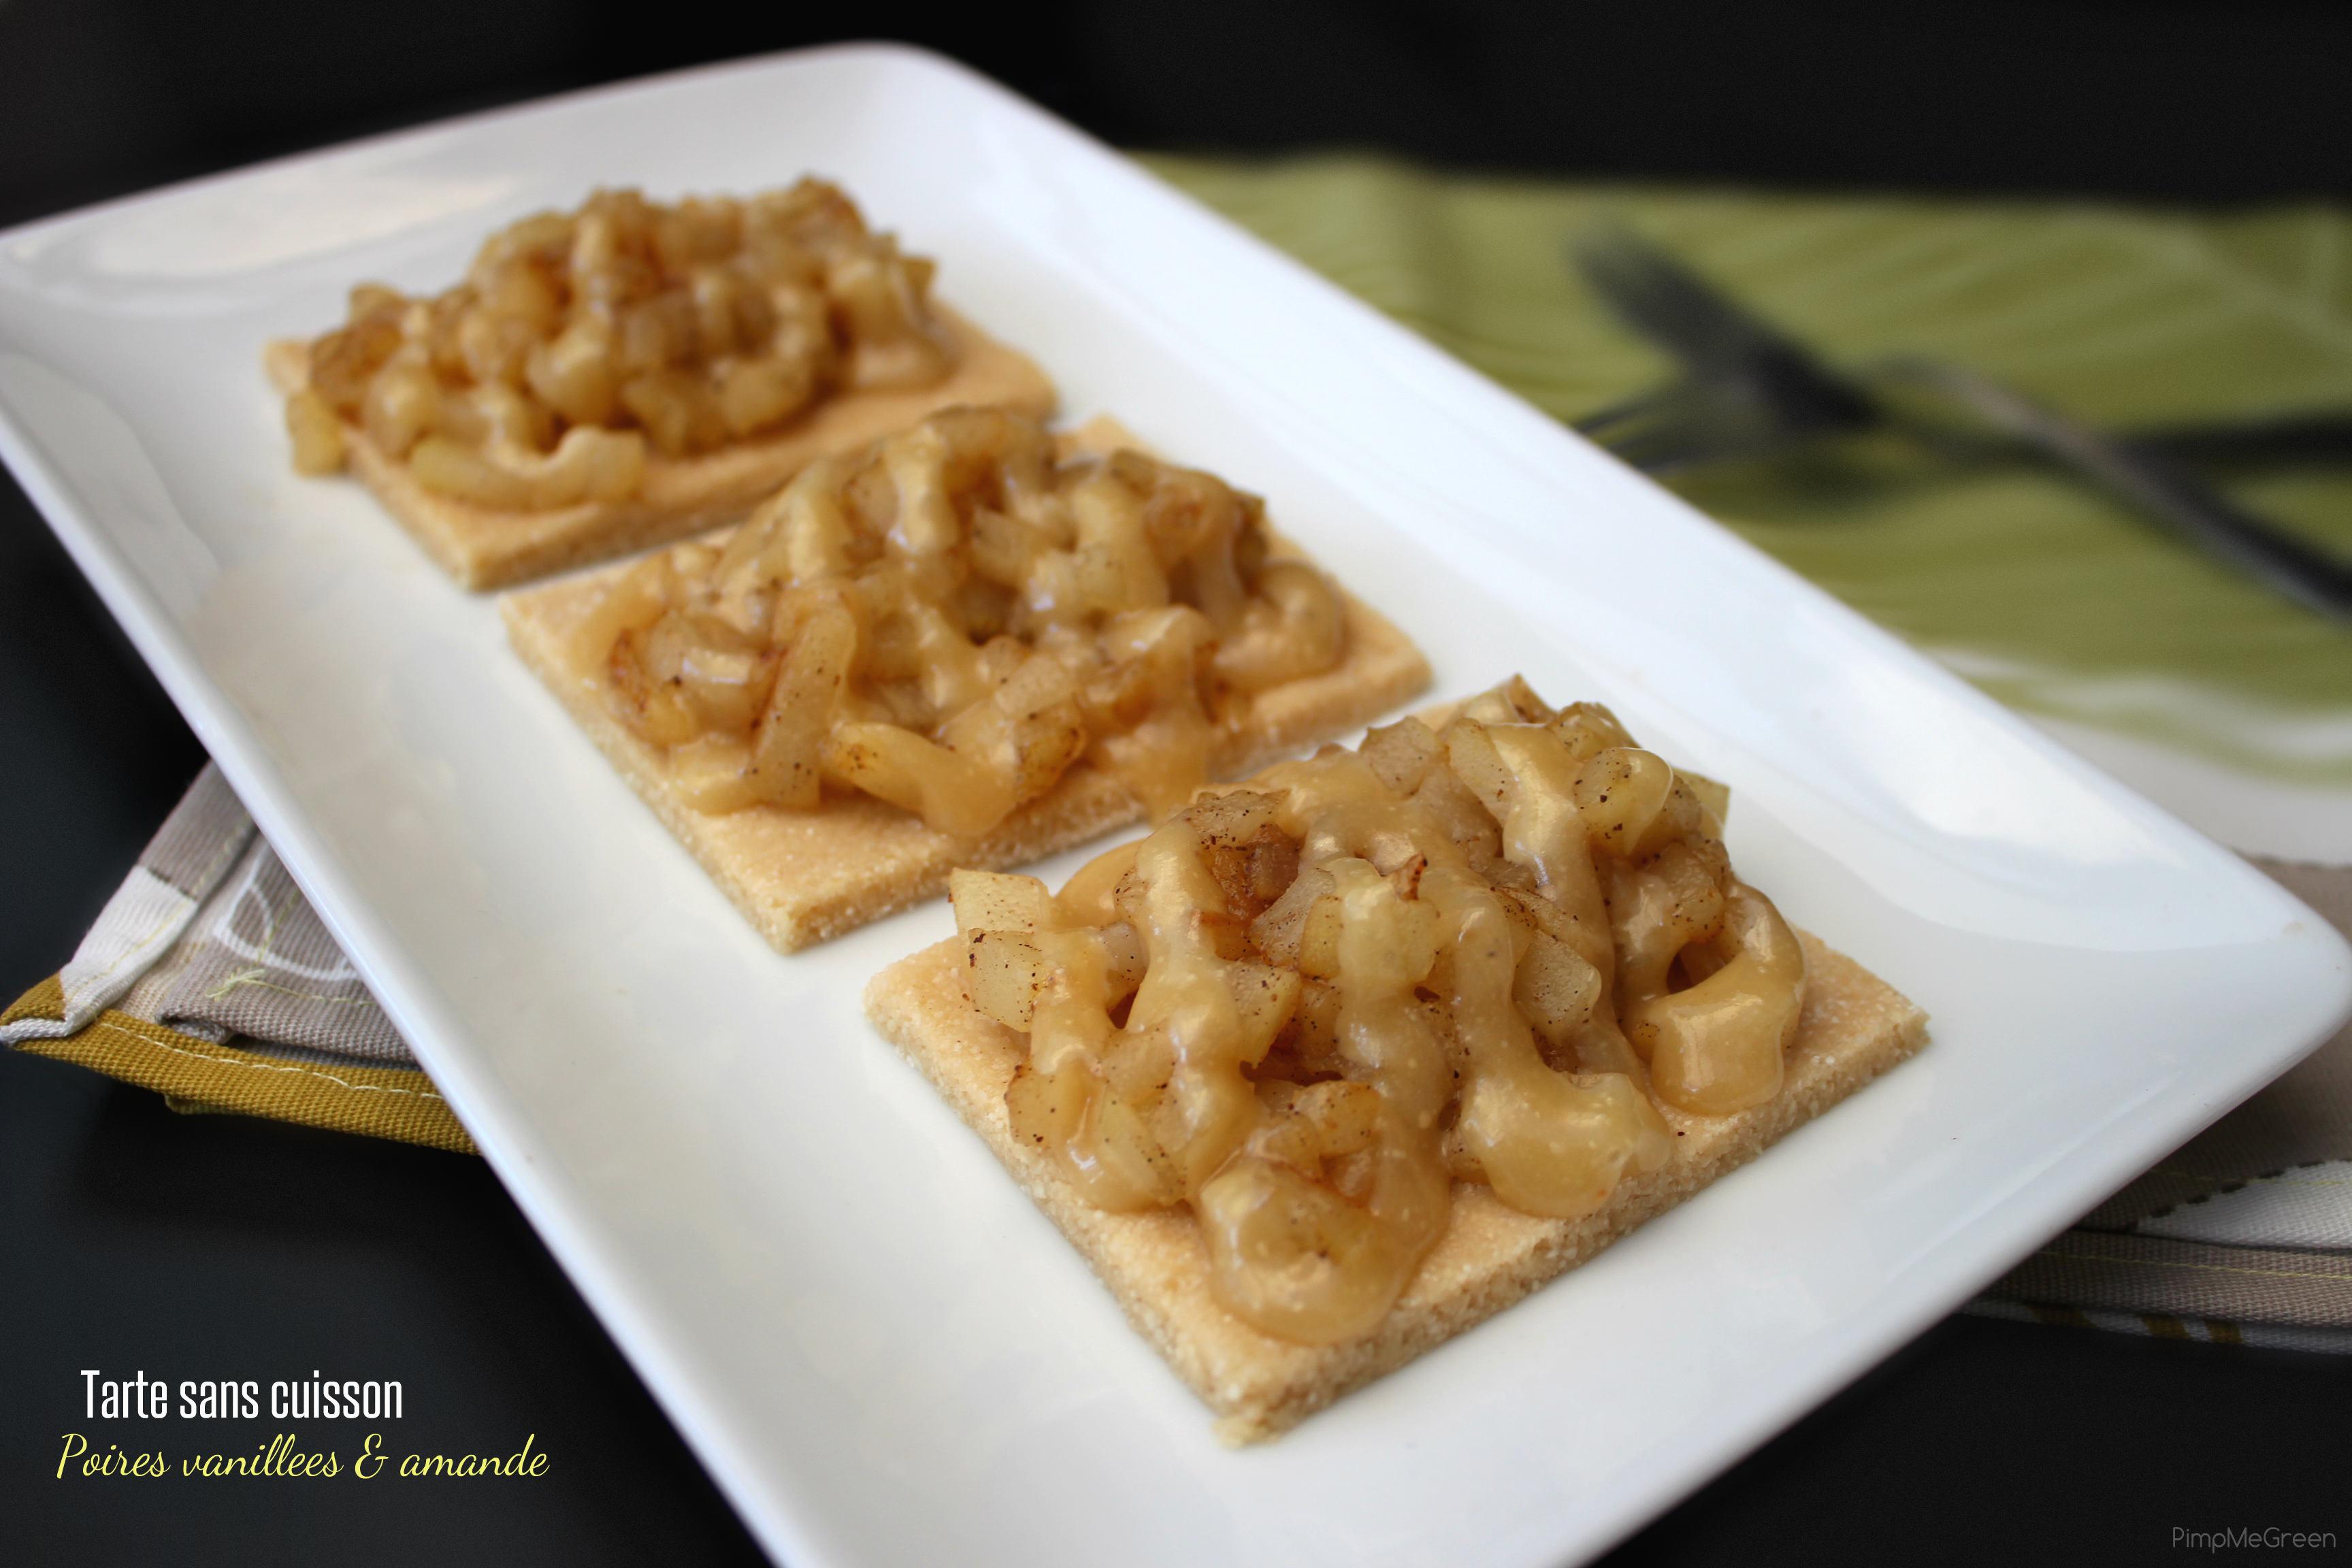 tarte-poires-vanillees-2-titled